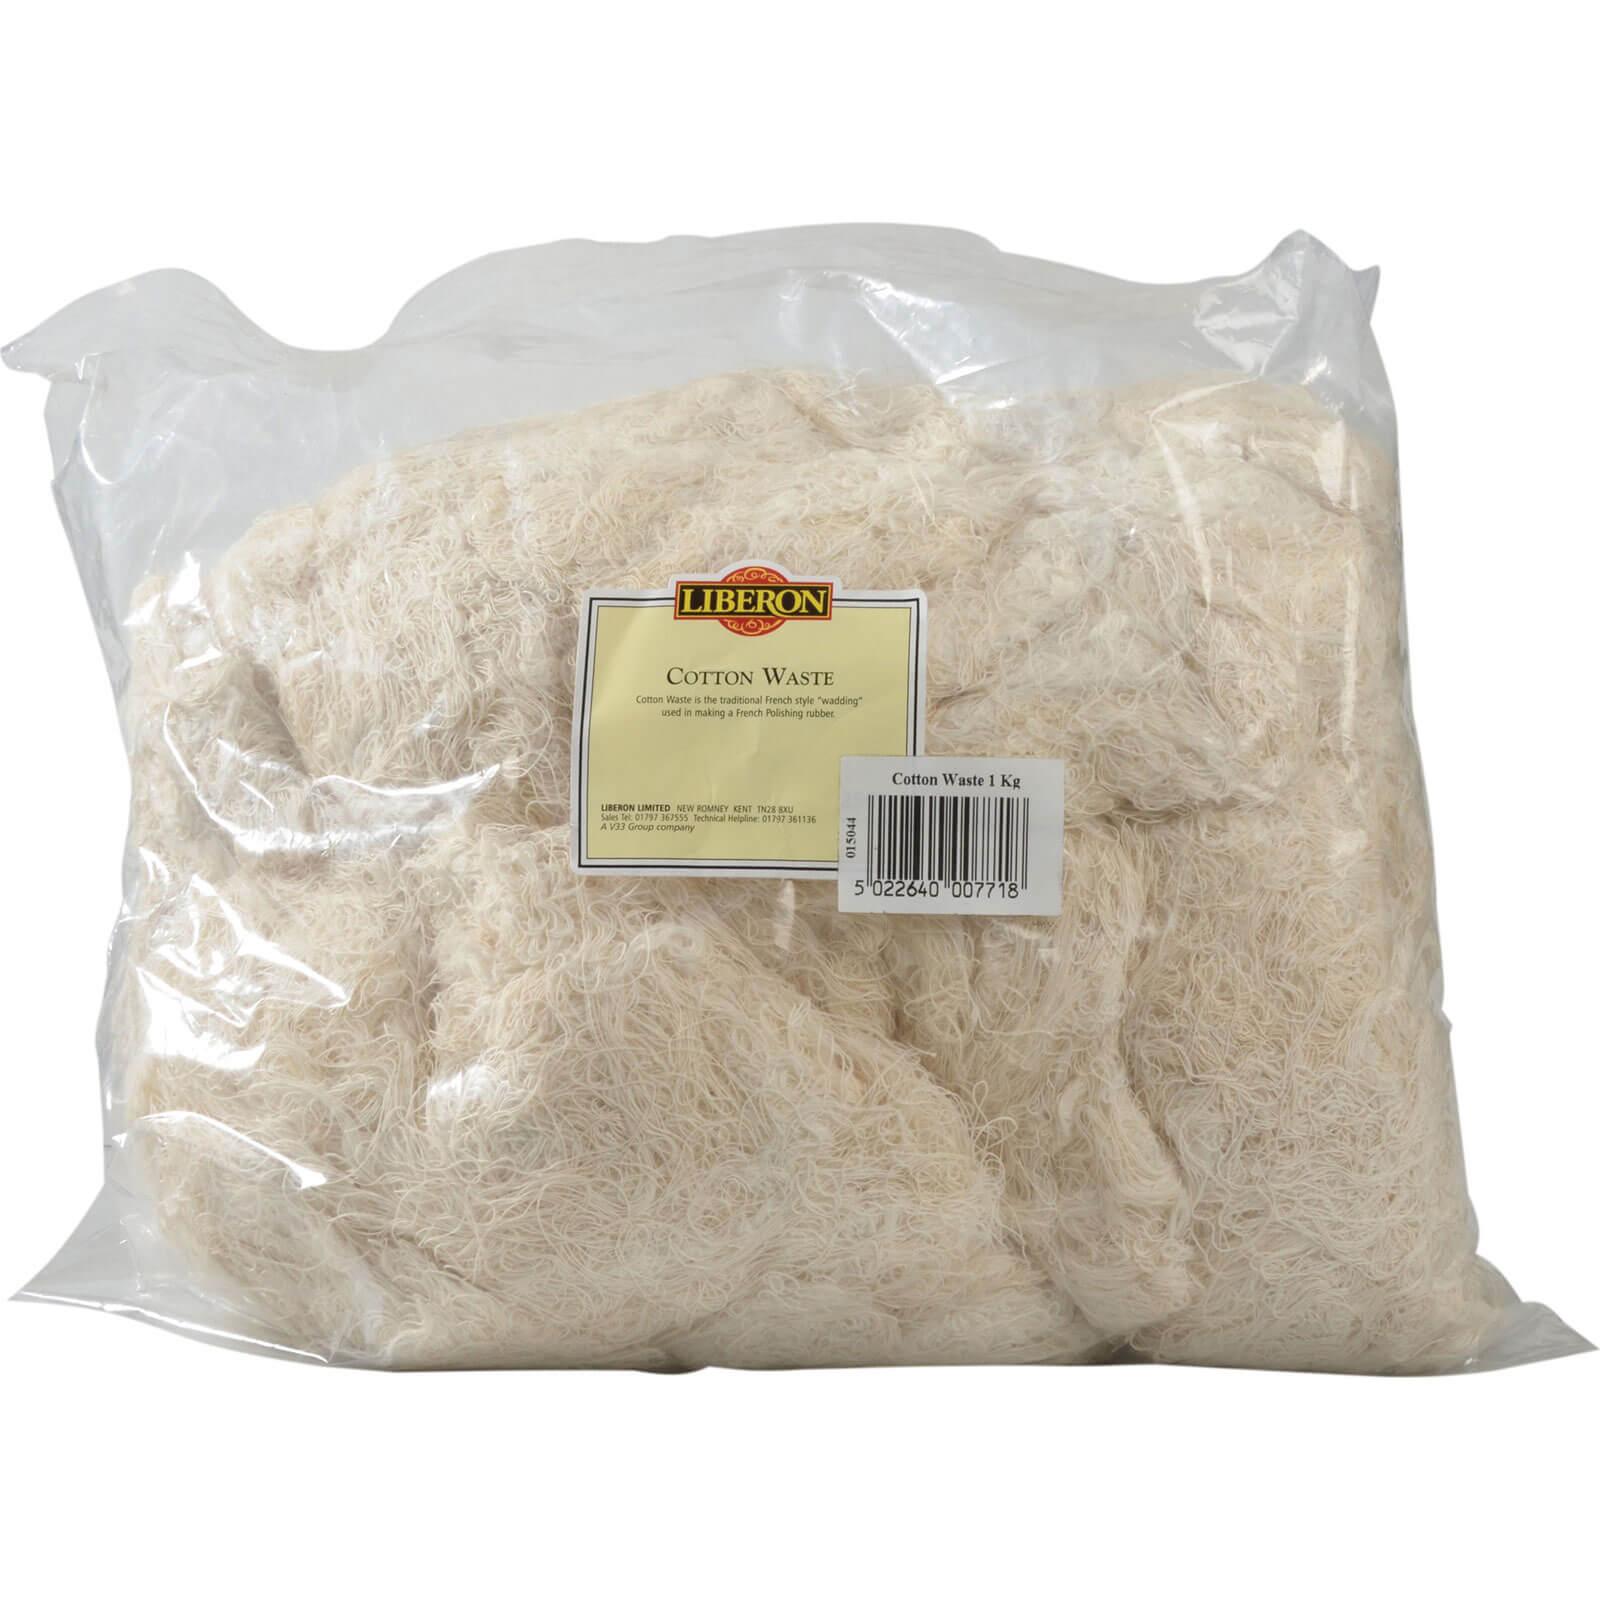 Image of Liberon Cotton Waste 1kg